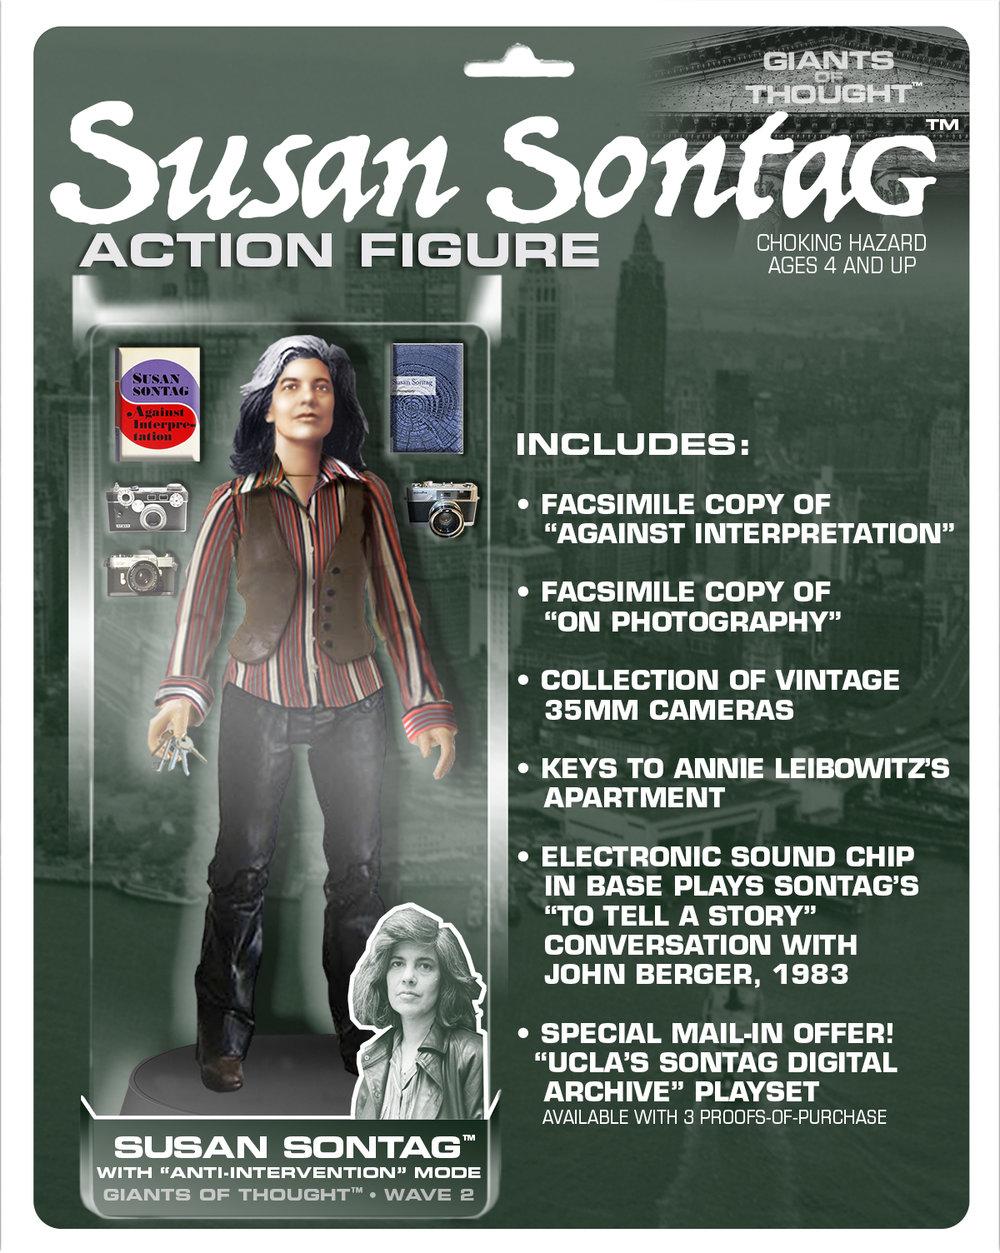 SusanSontag-1.jpg